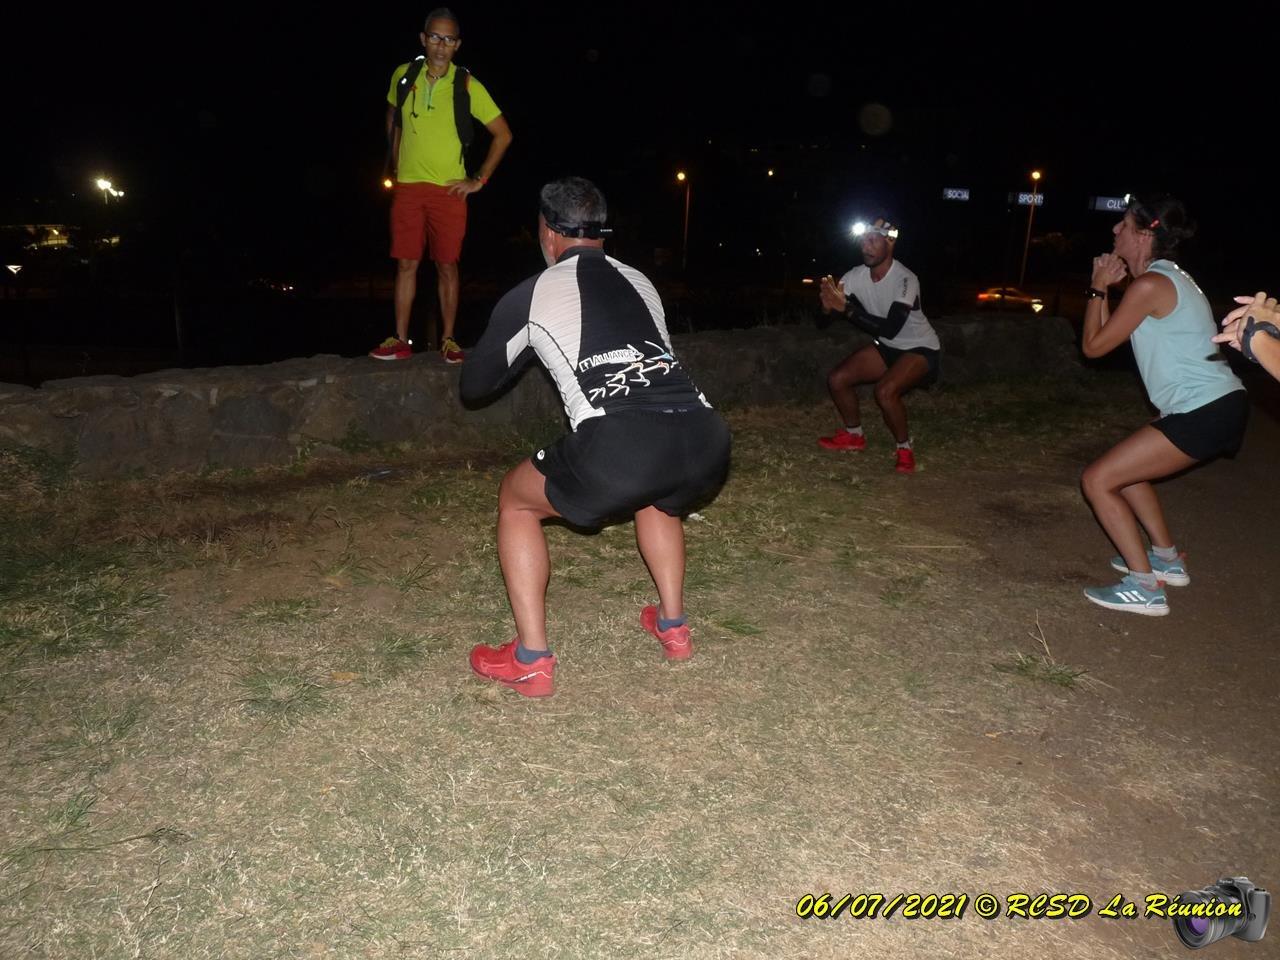 20210706 Entrain Trail Trinité 029